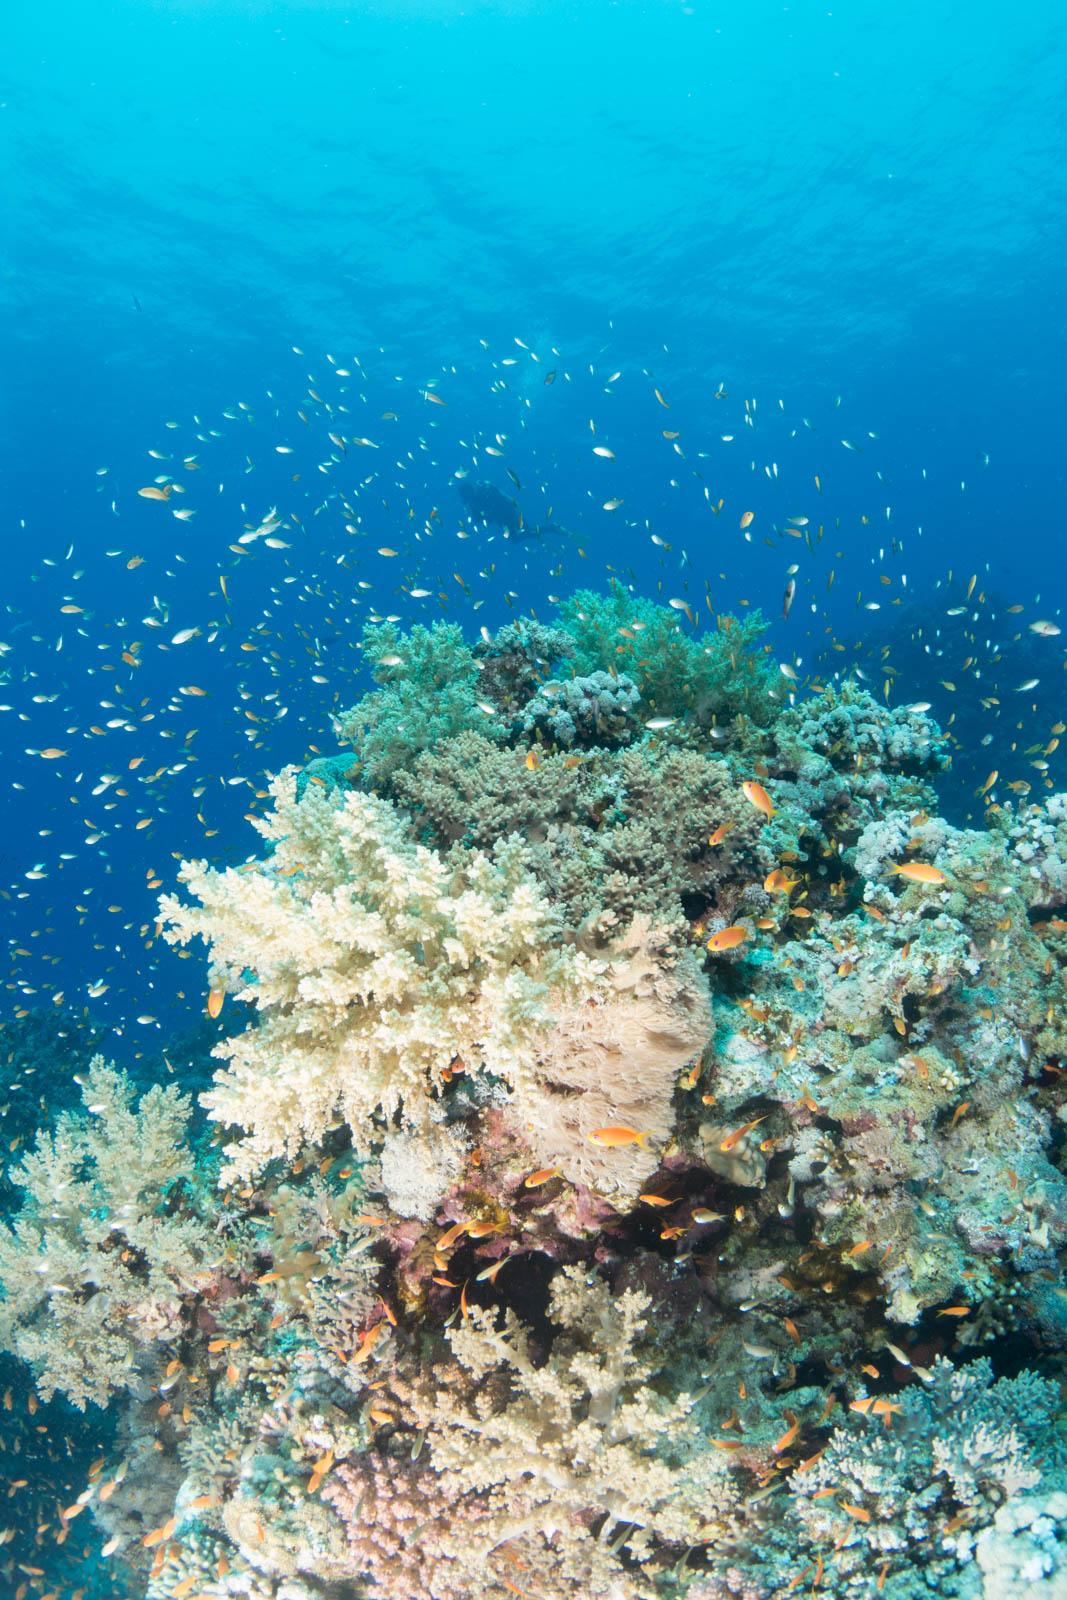 Unterwasserfotografie Bildbearbeitung Erg Monika Riff